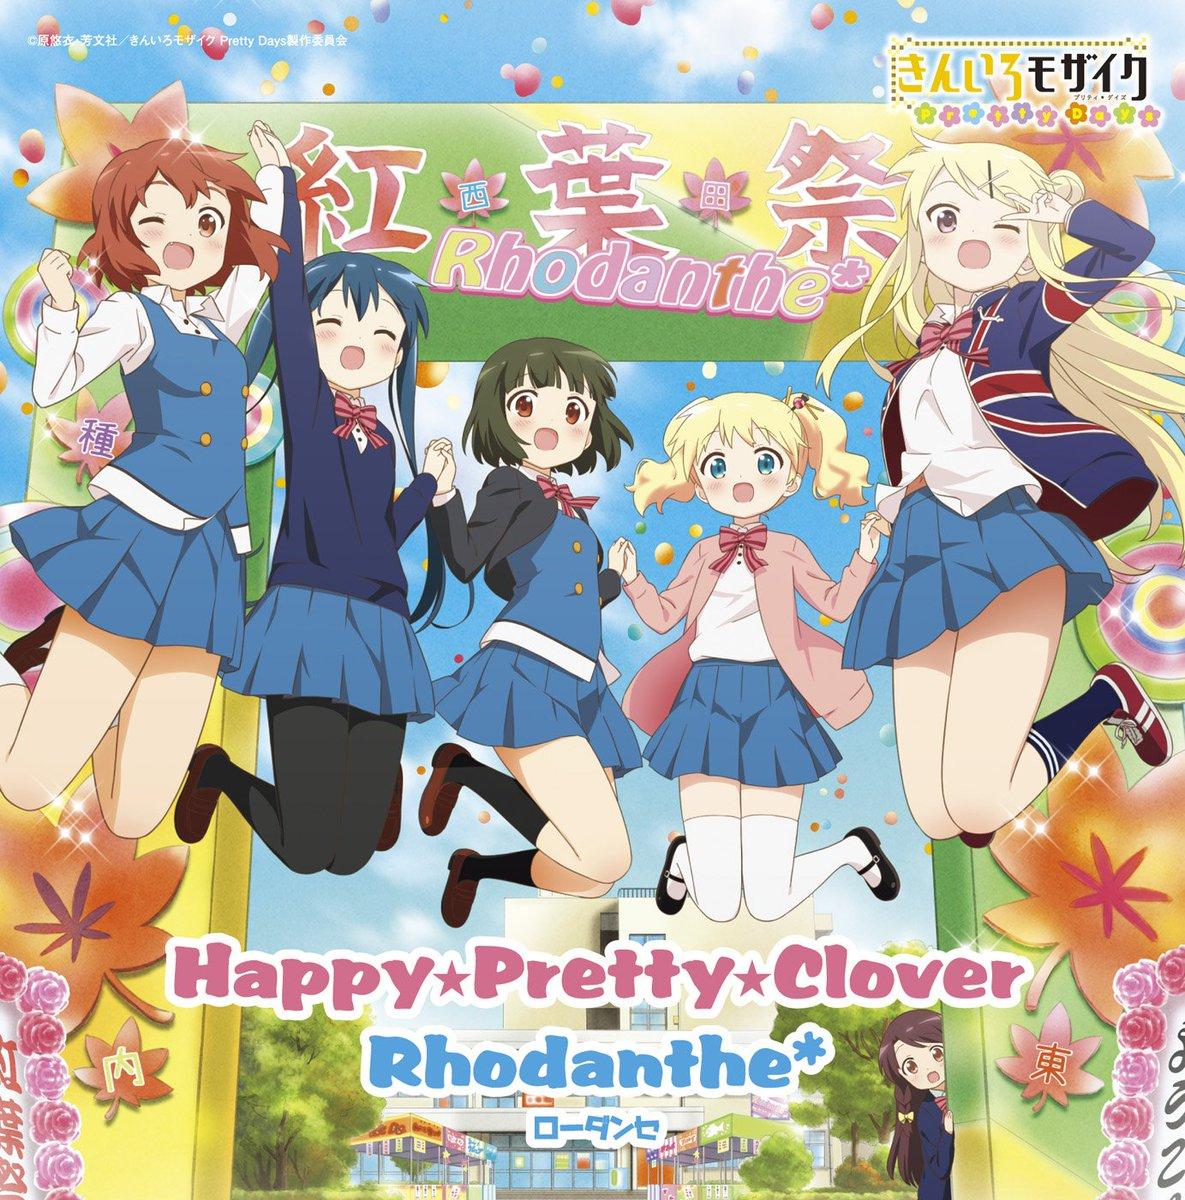 【Rhodanthe*】11月9日発売のニューシングル「Happy★Pretty★Clover」ジャケット画像を公開しました!! https://t.co/dWVxHHBX3M https://t.co/LcgIGTVNJD